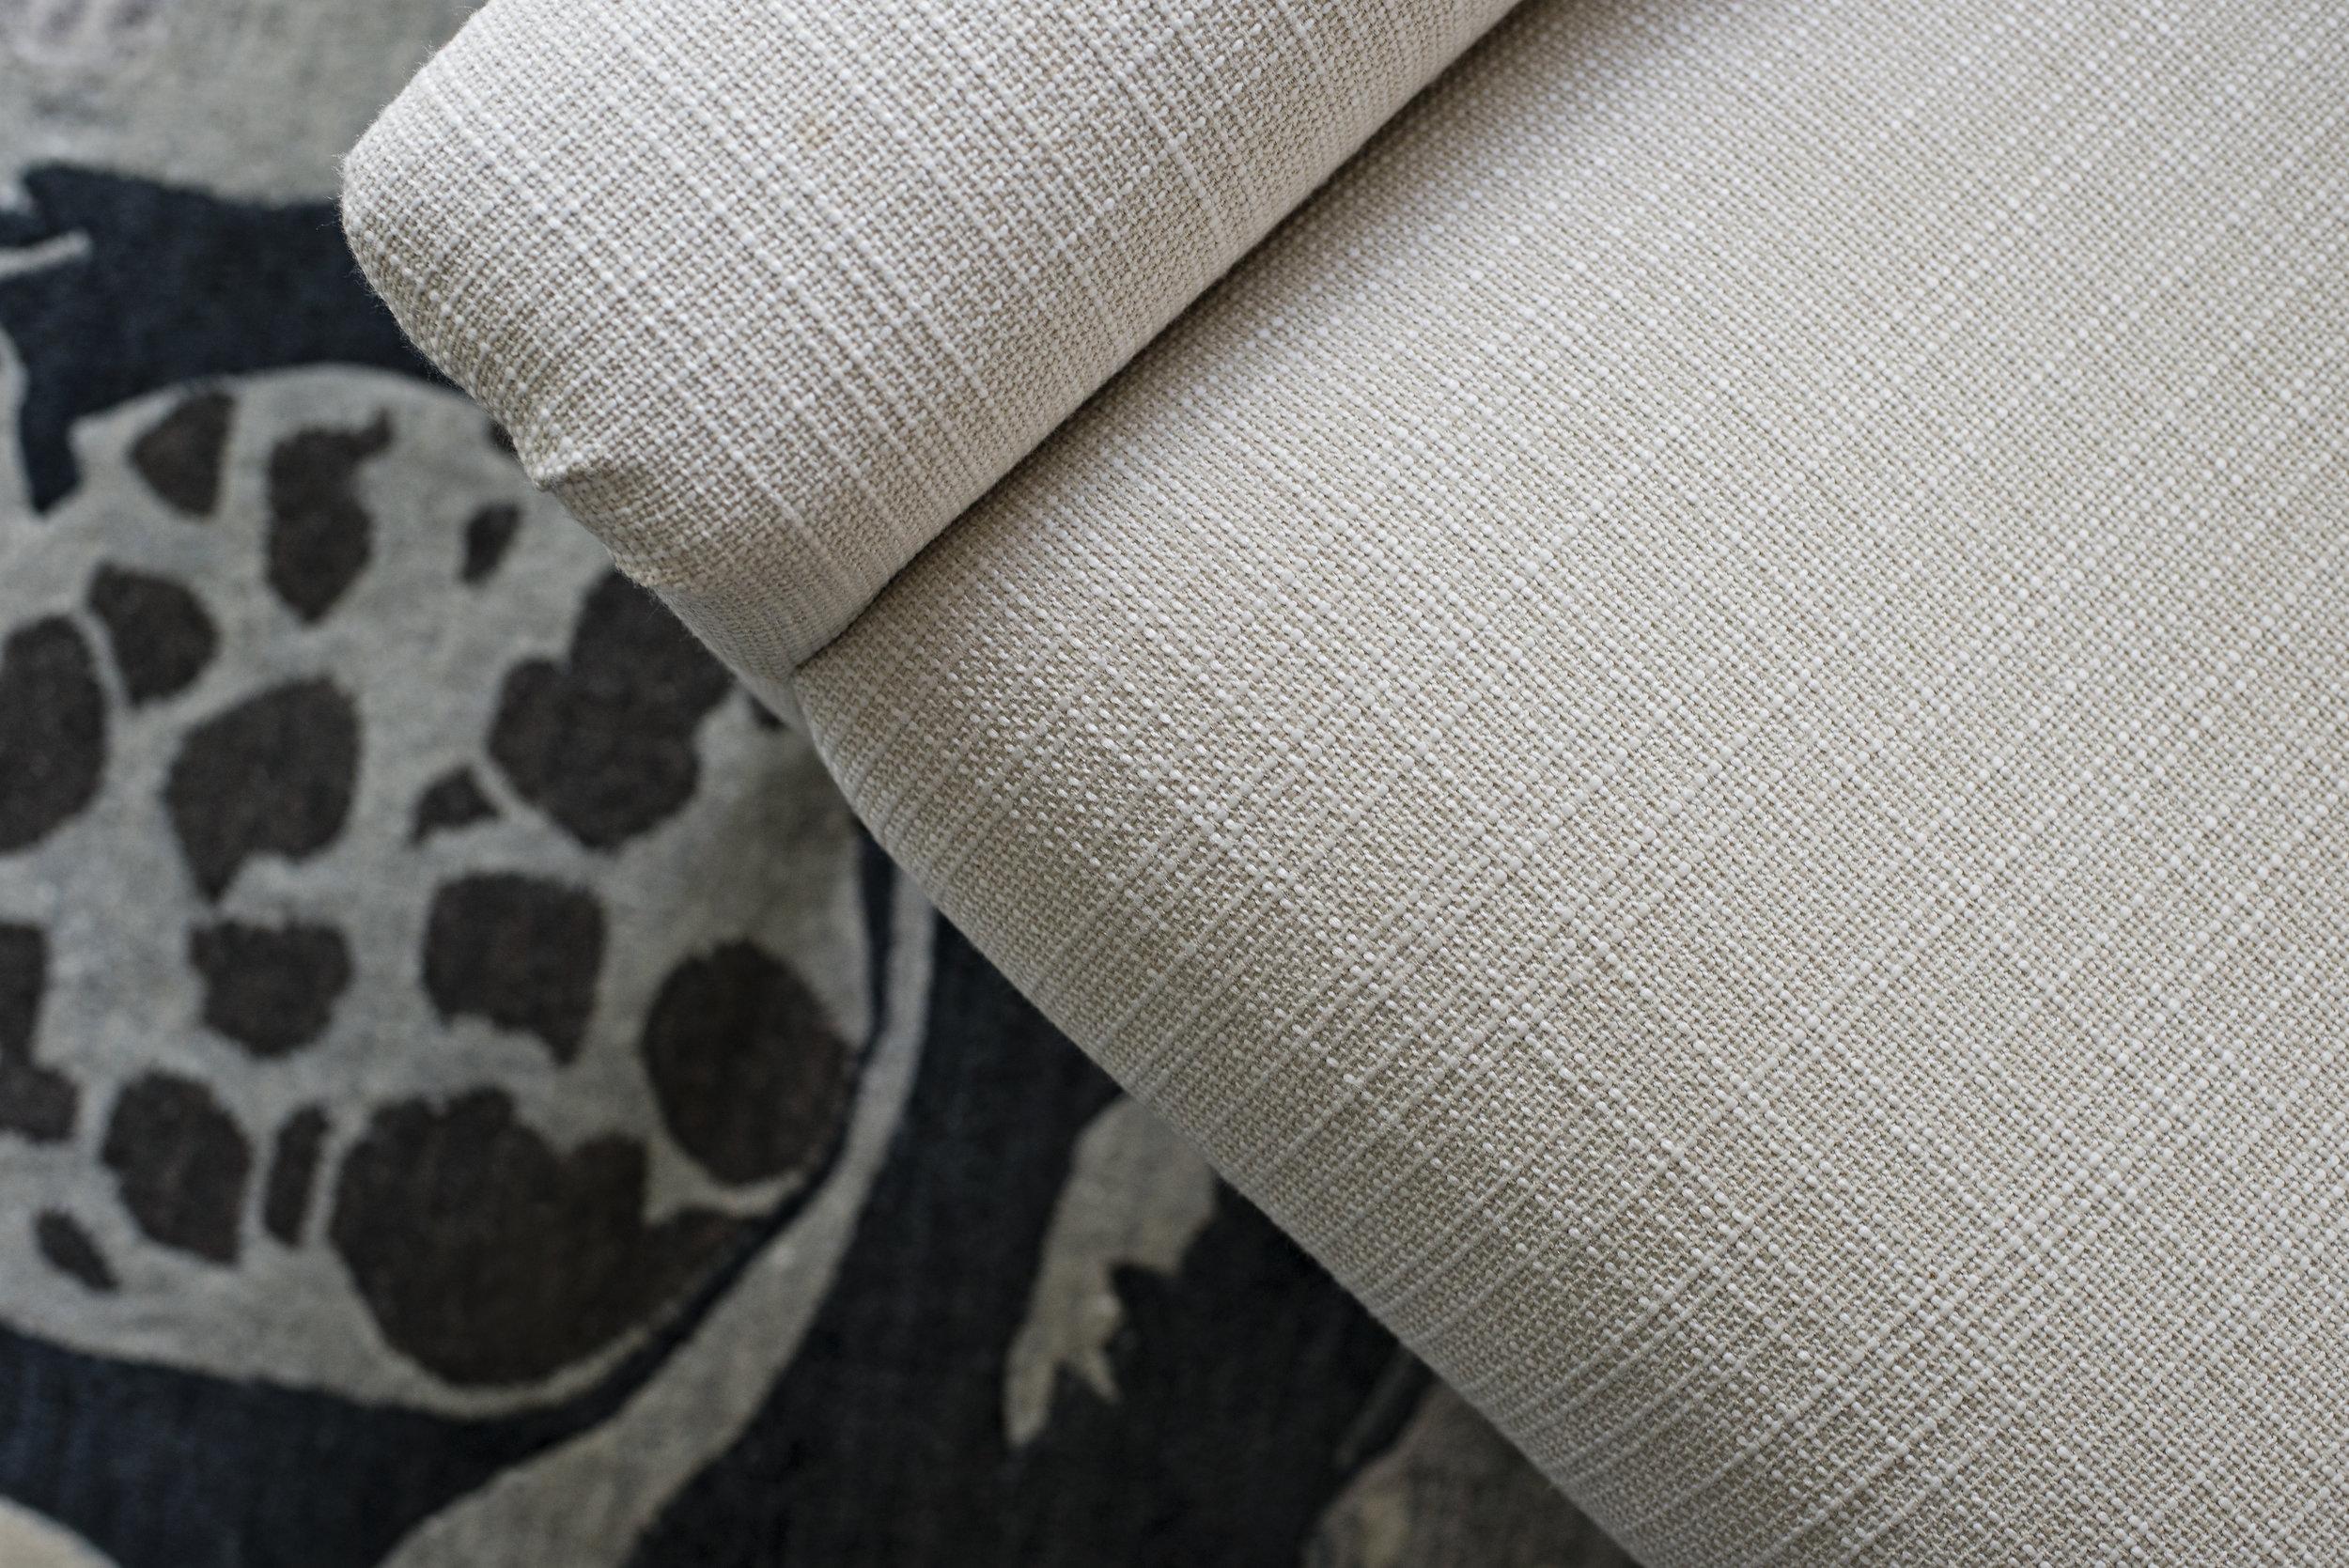 Family Room chair and area rug.jpg